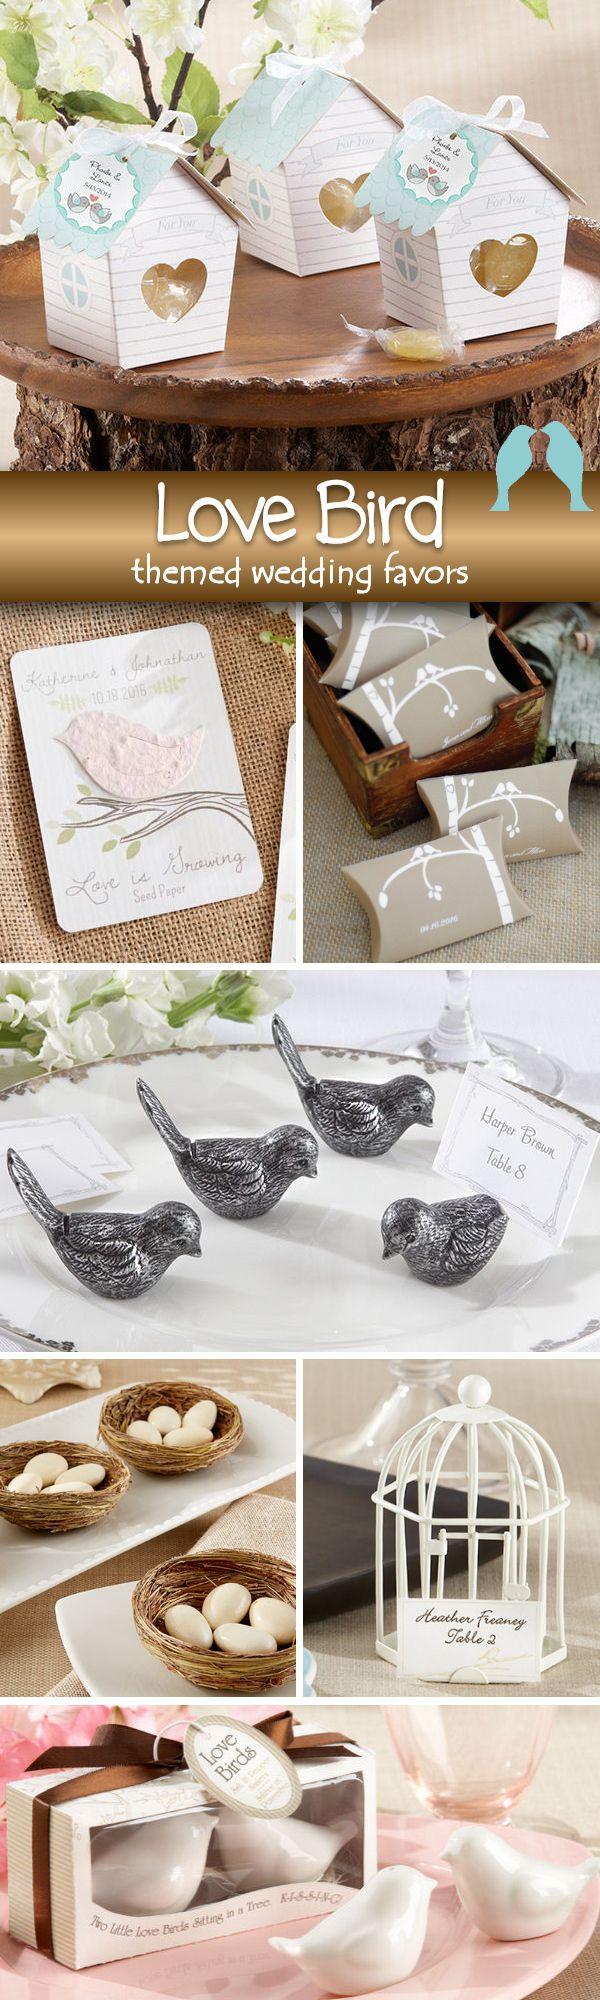 75 Amazing Love Birds Themed Wedding Favors The Wedding Pros The